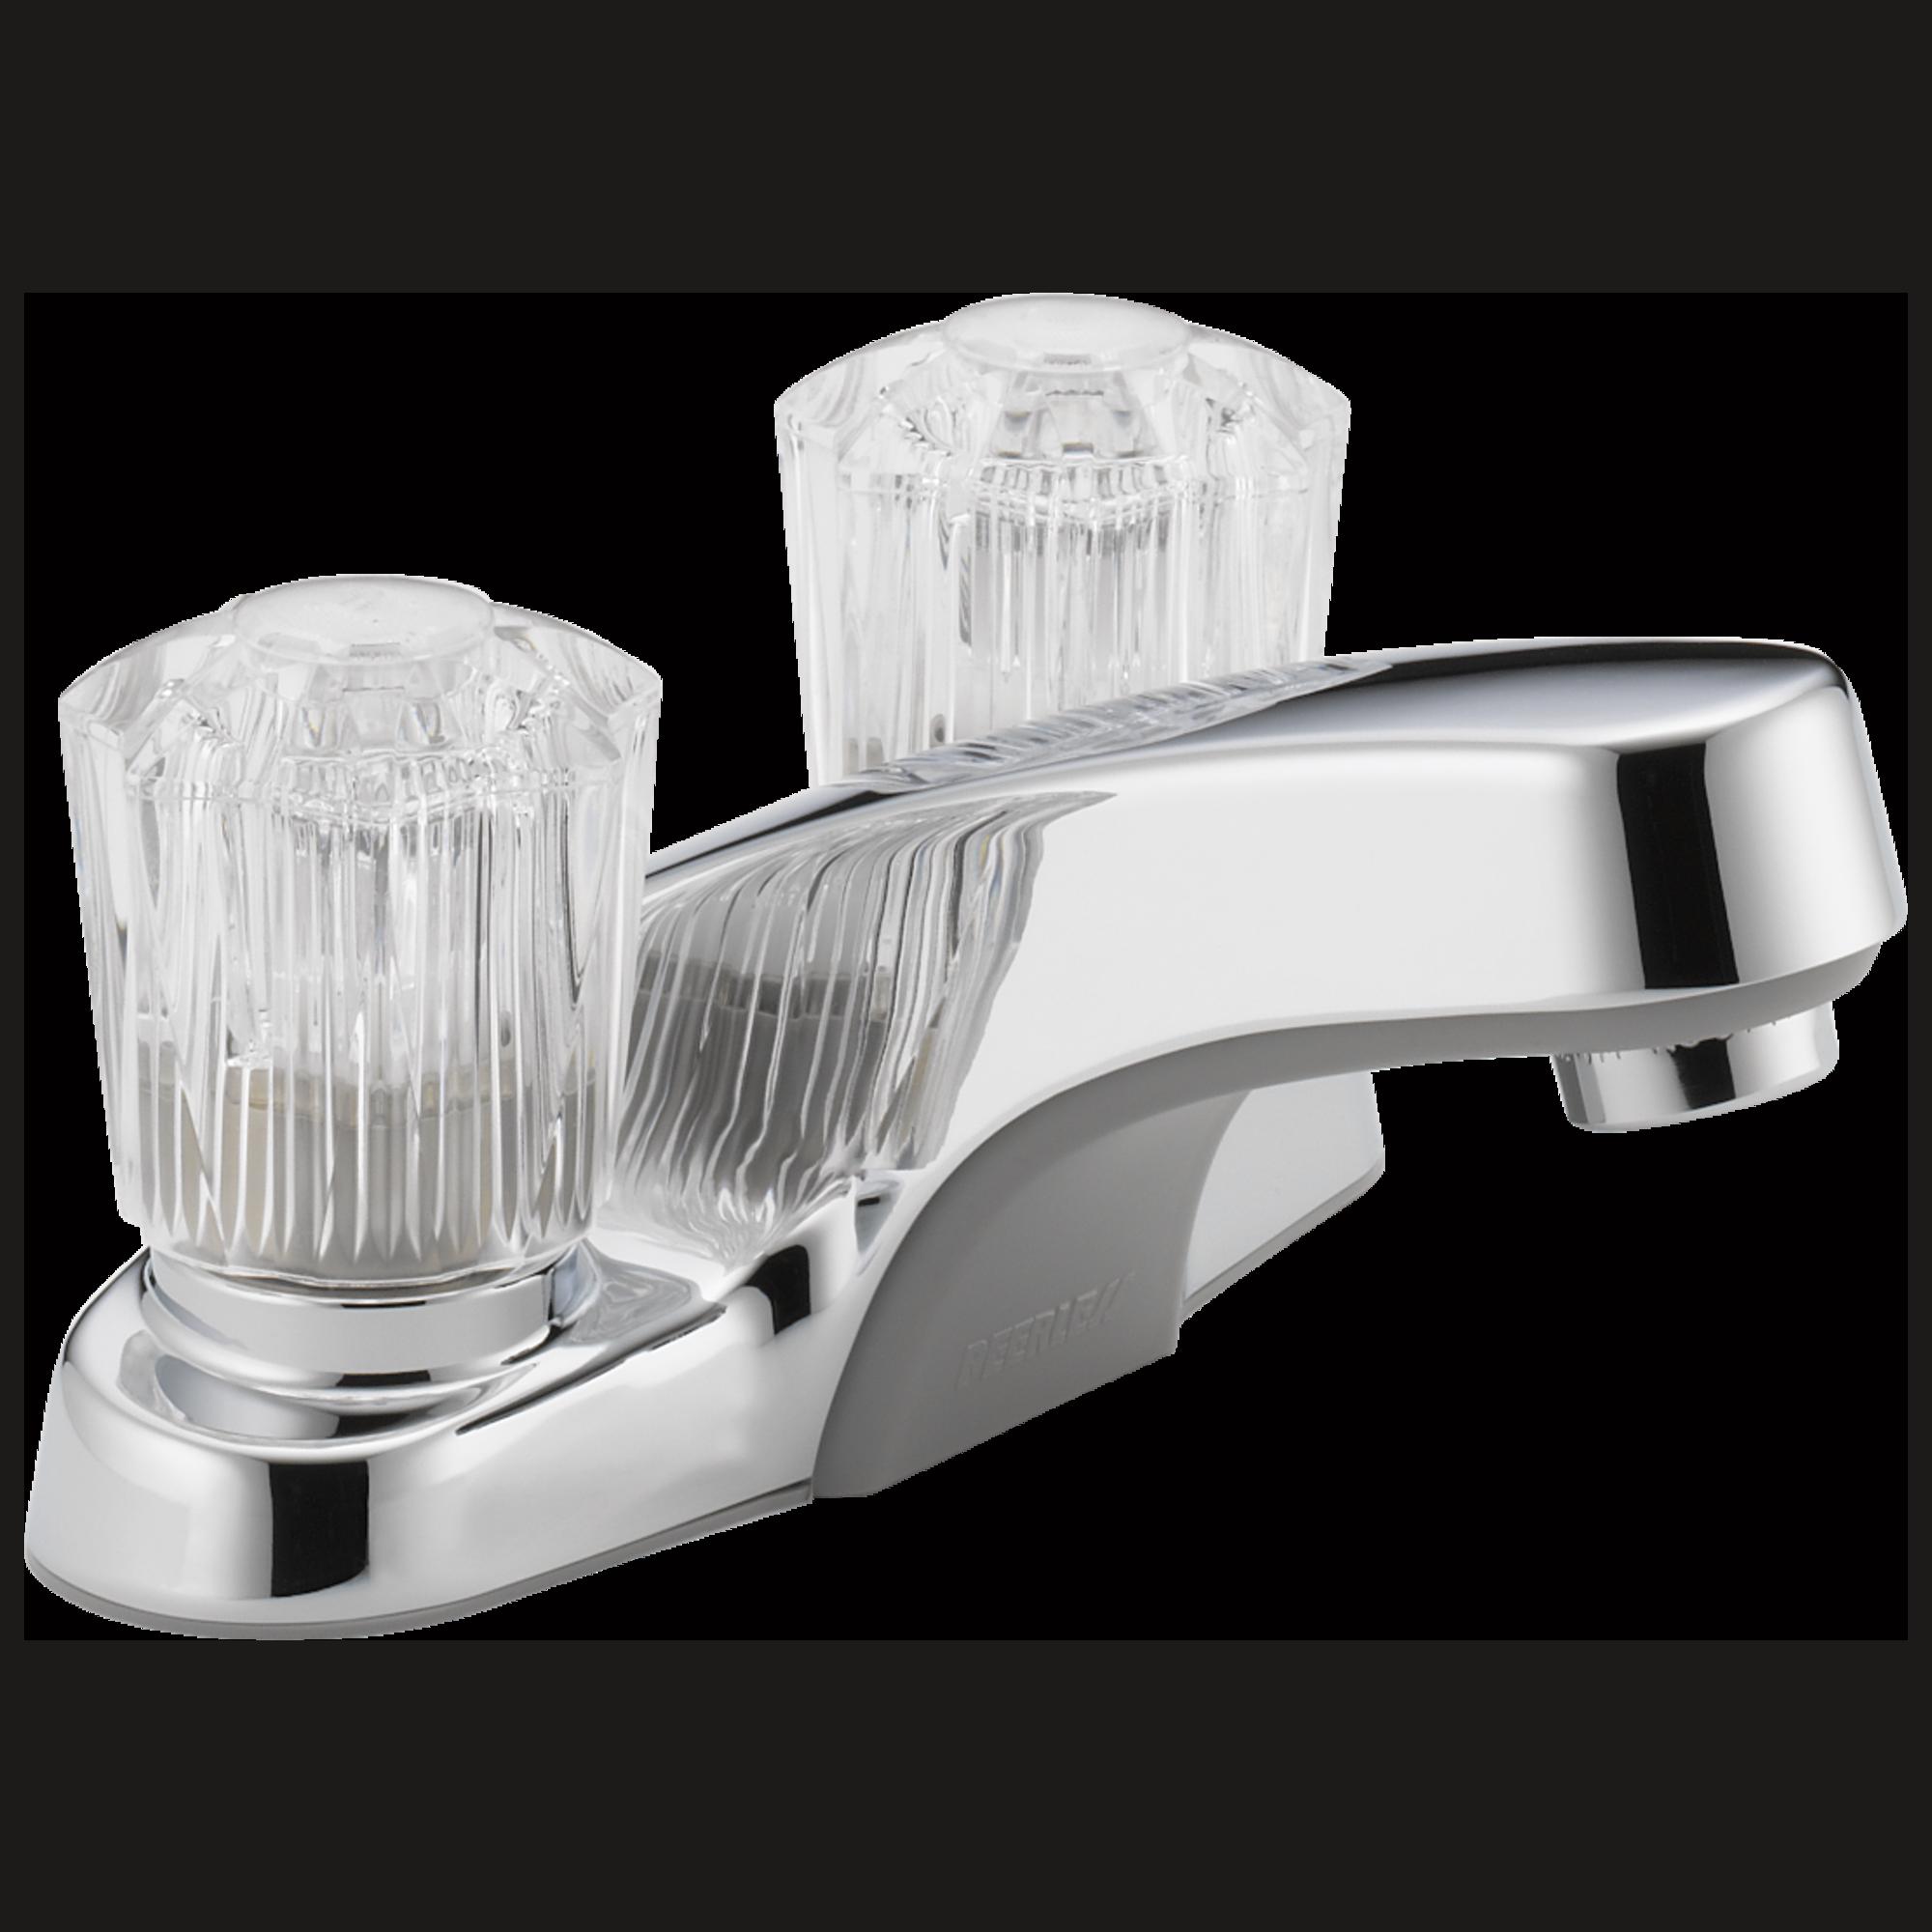 peerless bathroom faucet parts | My Web Value